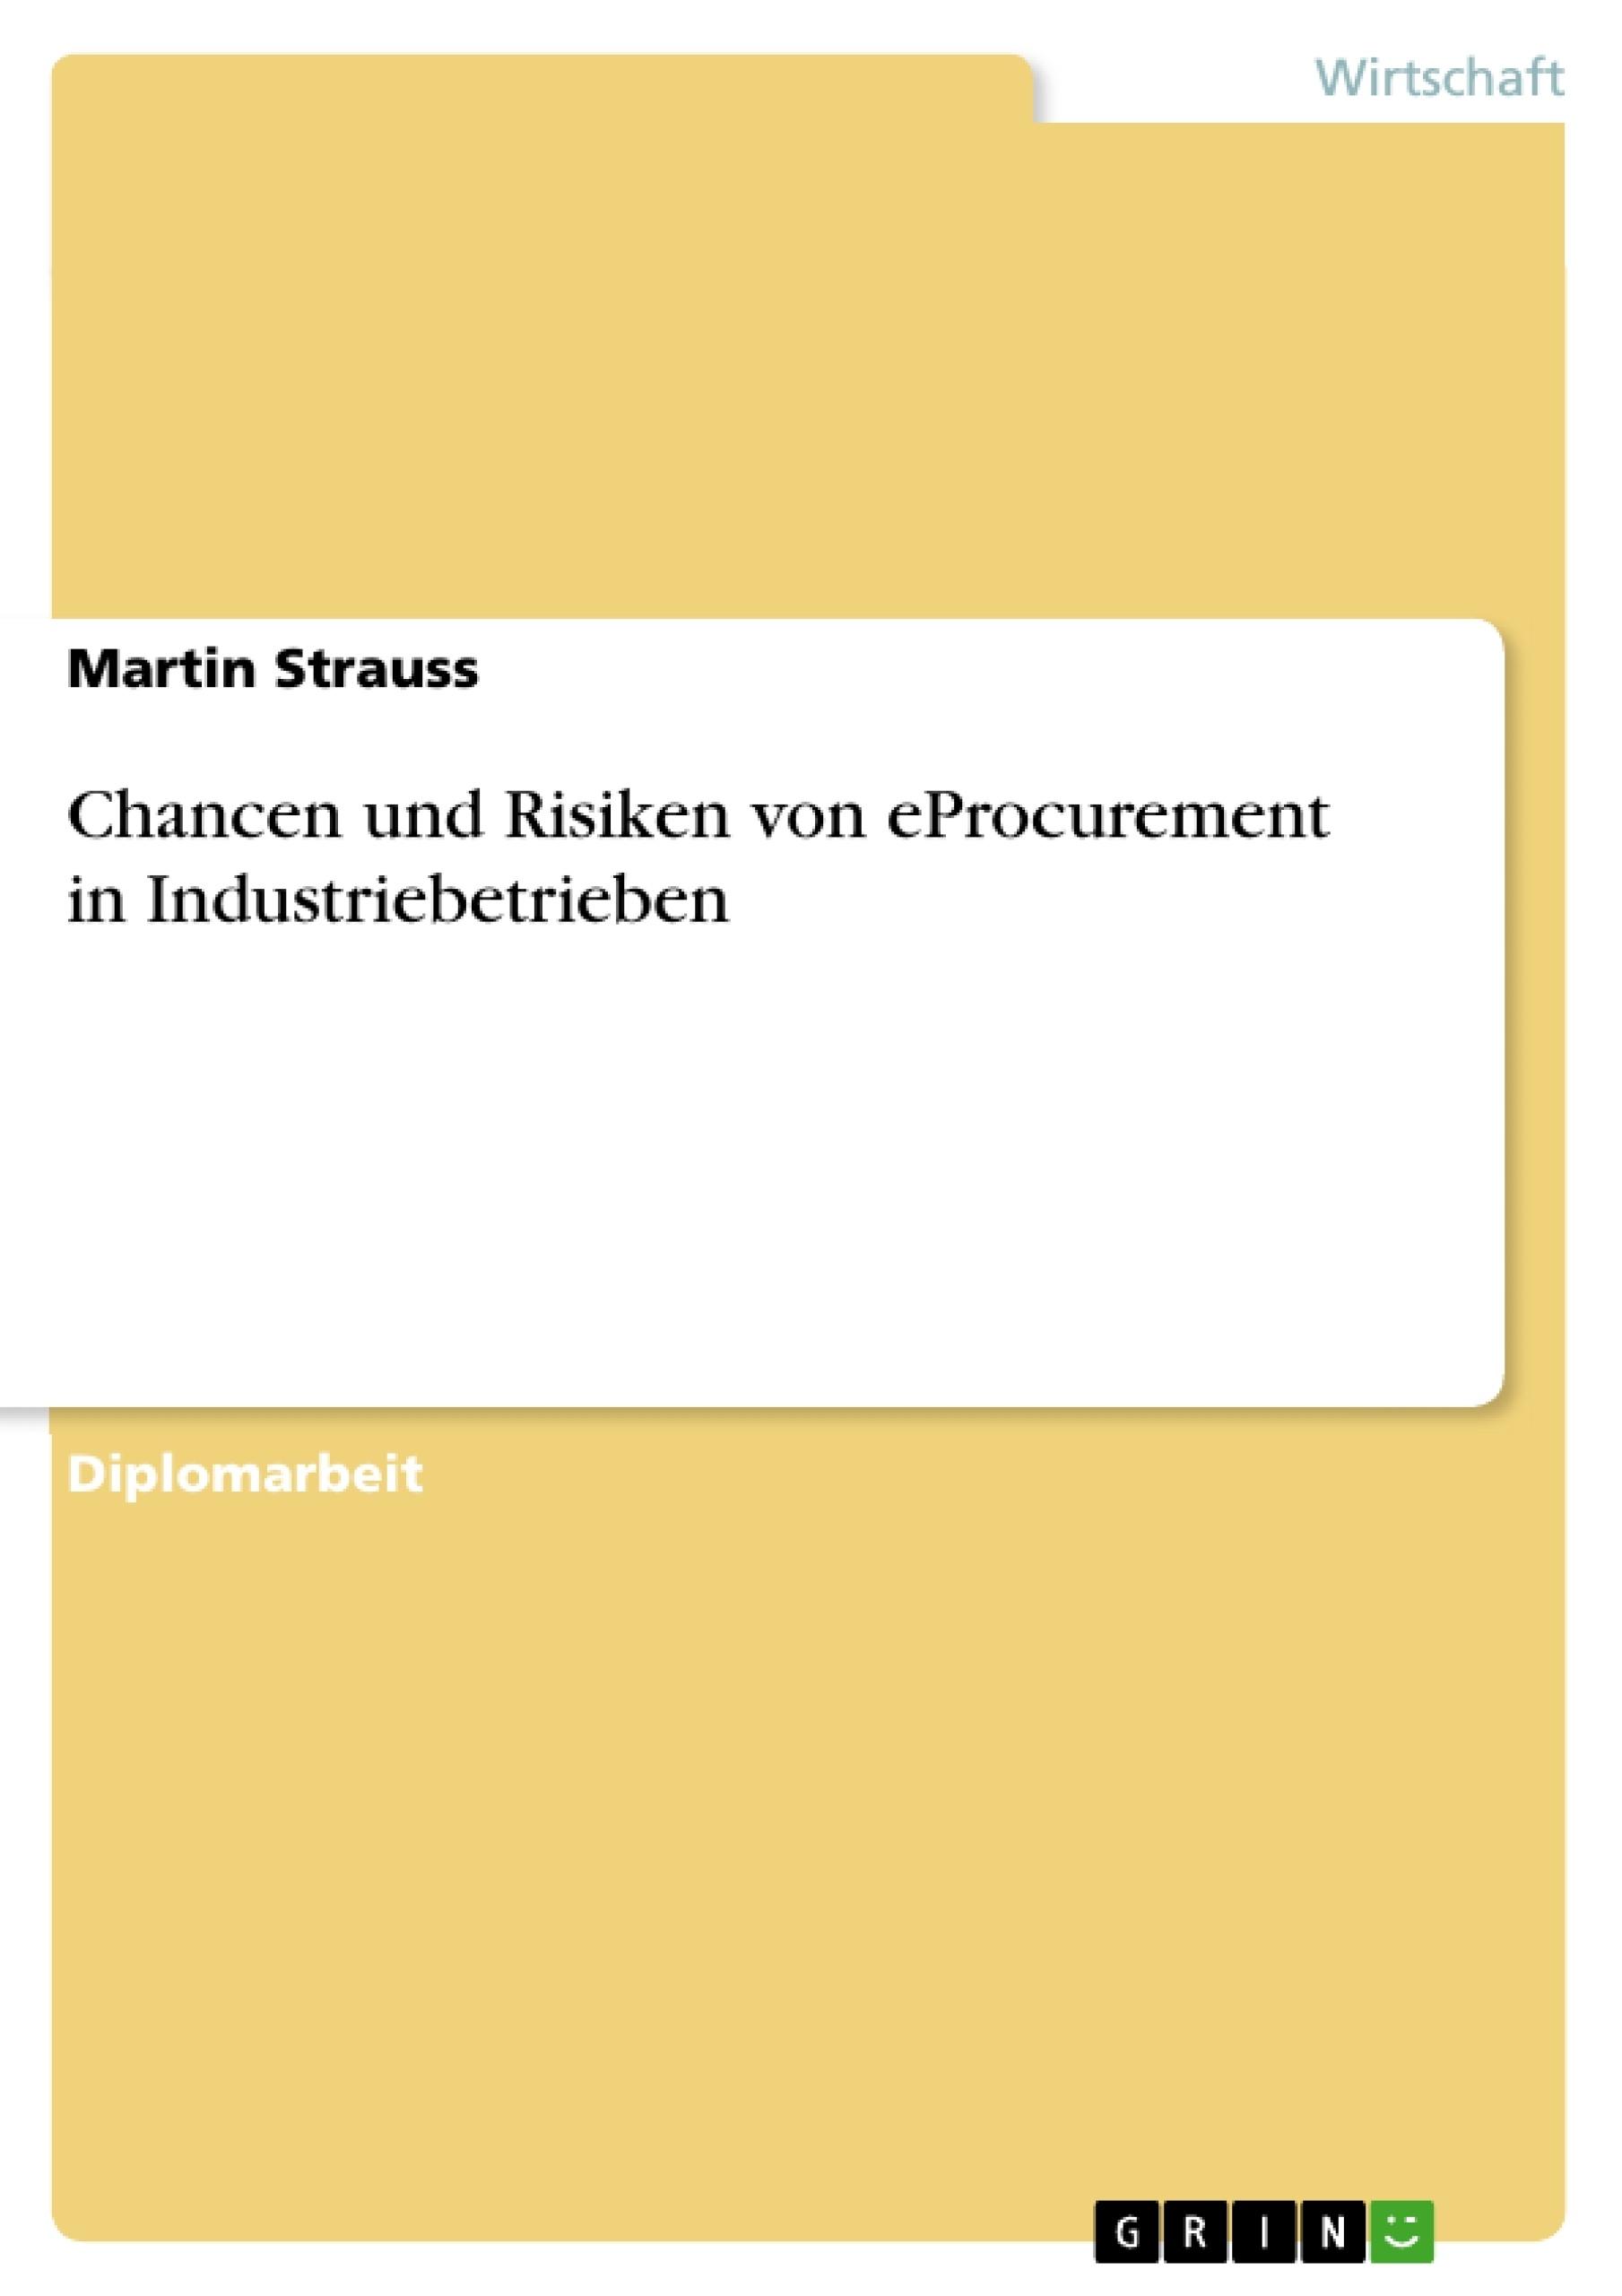 thesis on eprocurement